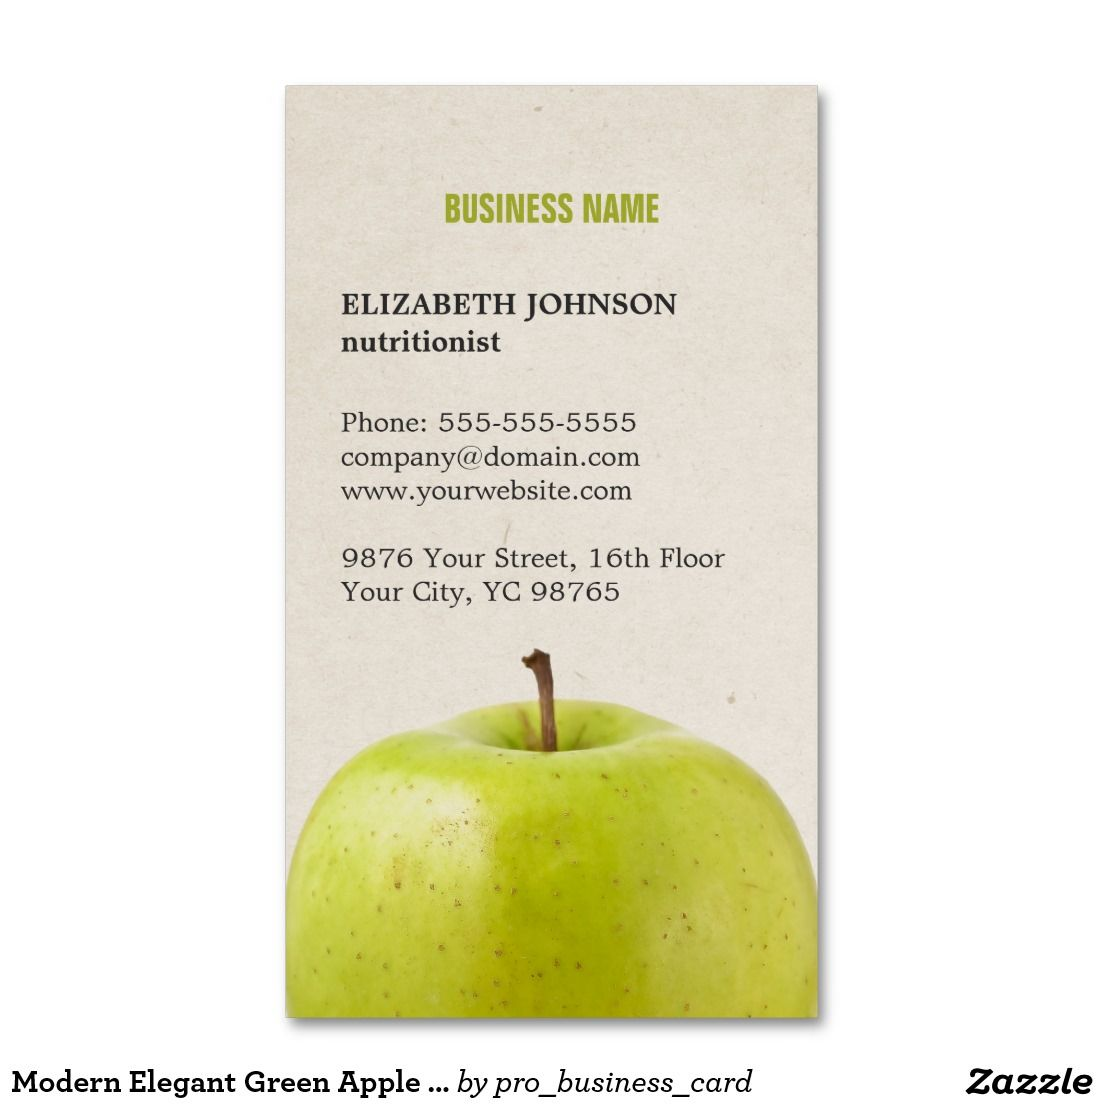 Modern Elegant Green Apple Photo Nutritionist Business Card ...